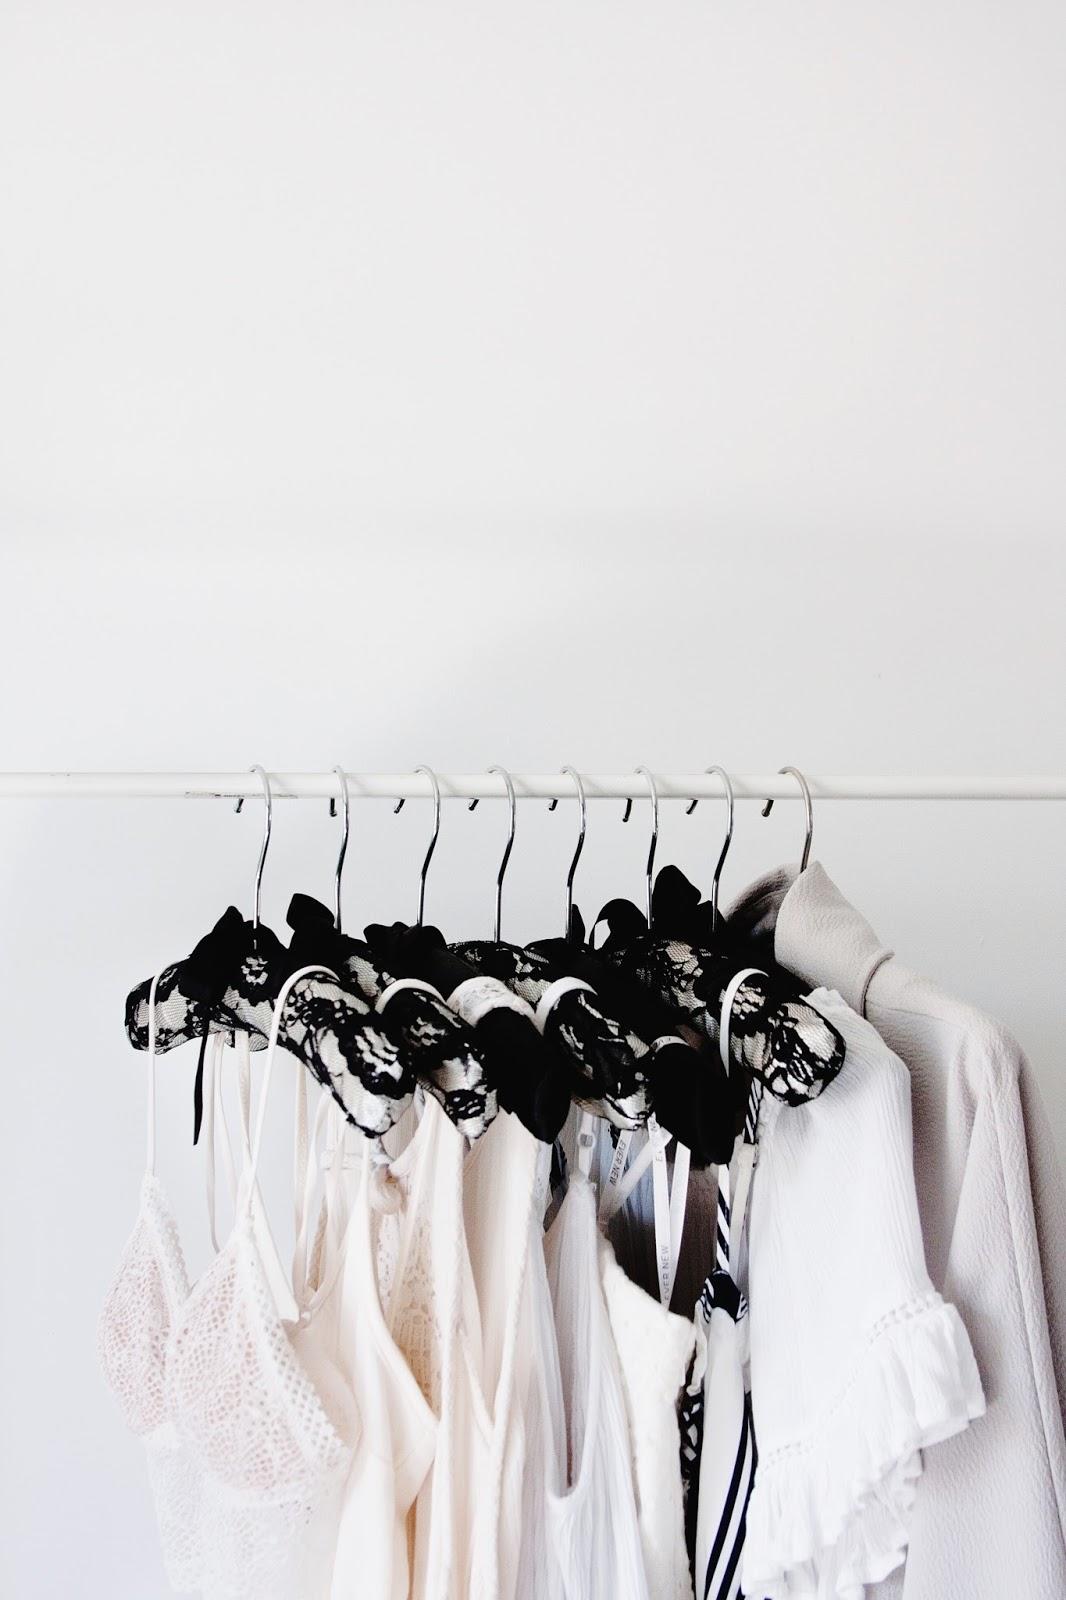 Summer Staple's for every girls closet!